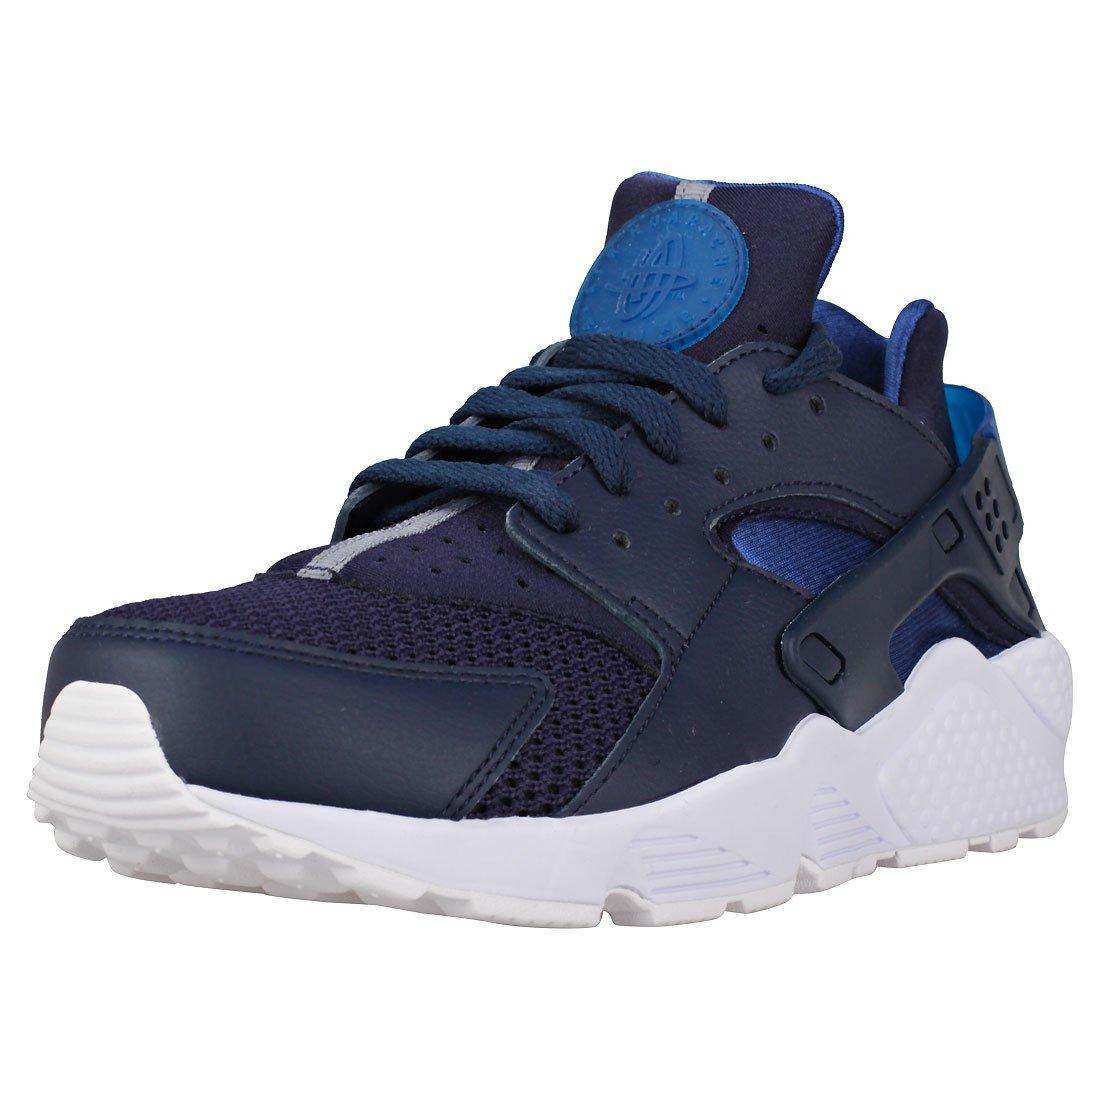 Nike Air Huarache Herren Laufschuhe  405 EU|Blau (Obsidian/Gym Blu/Bianco/Pure Platinum 420)